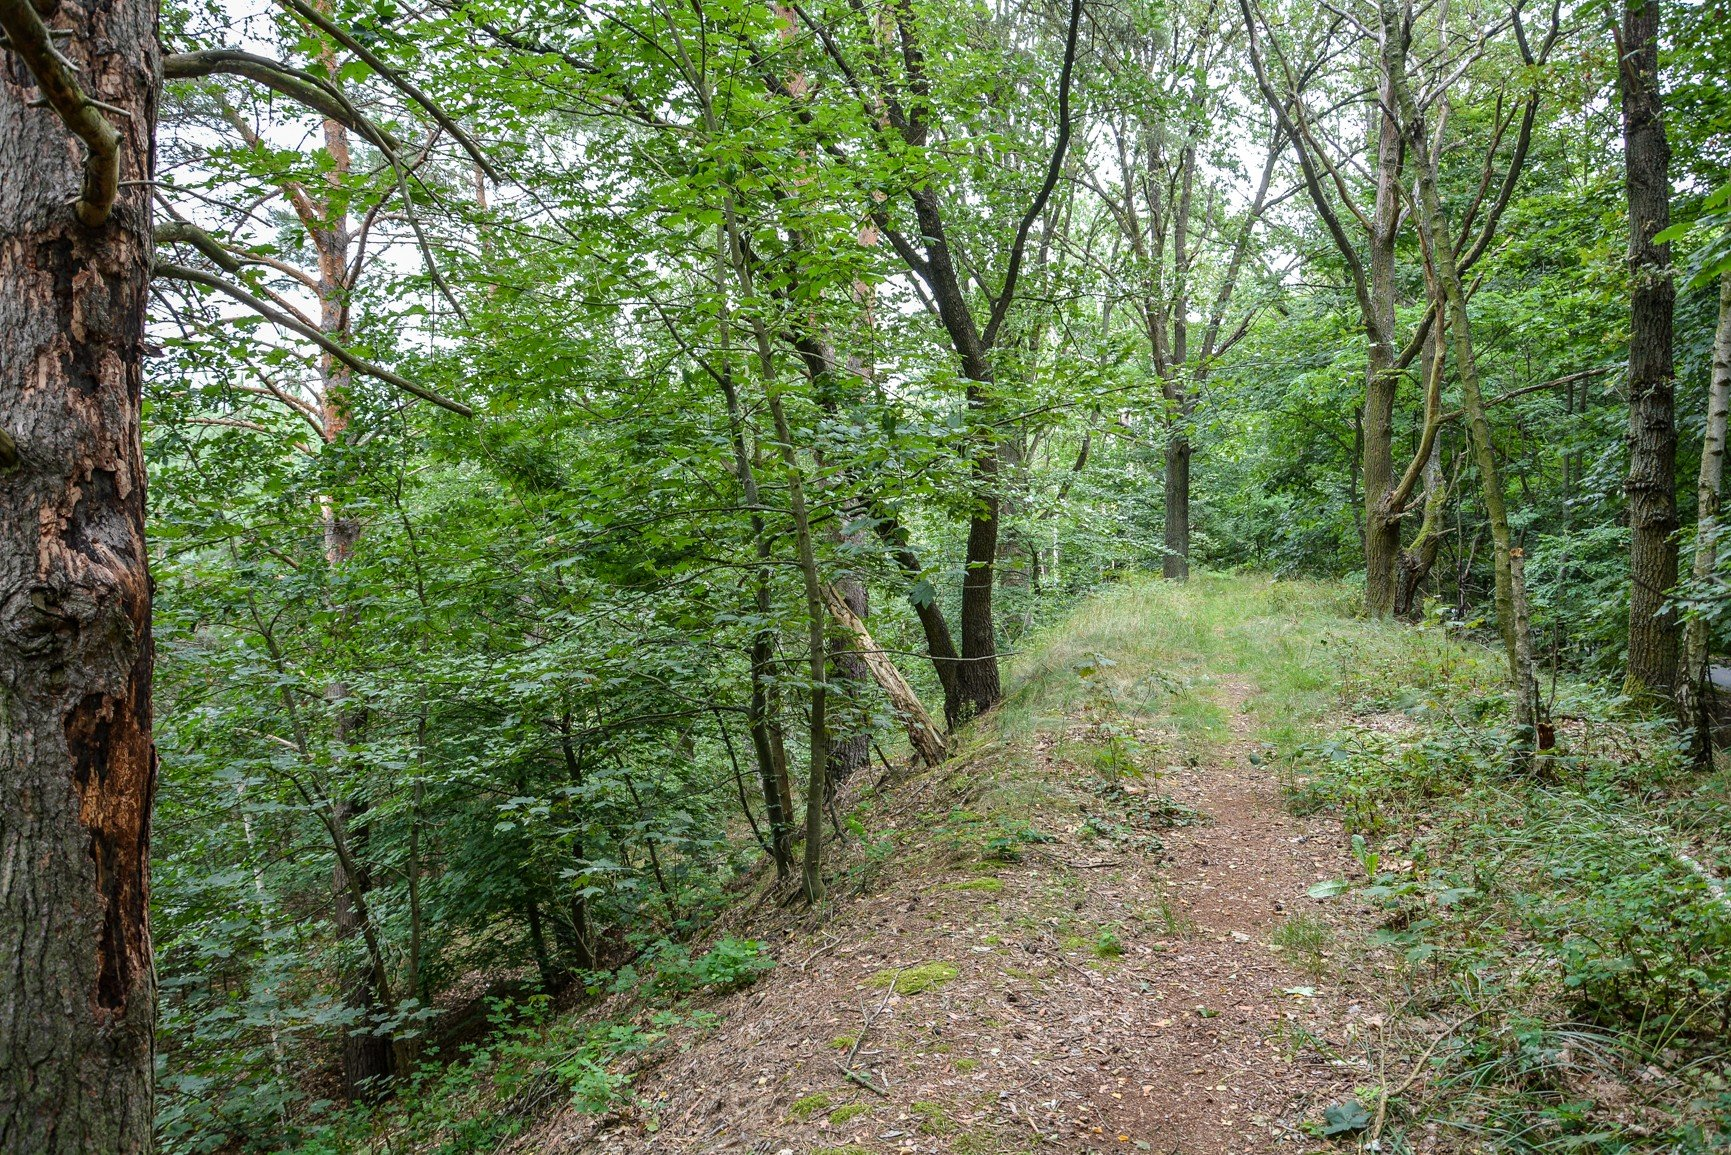 avus südkurve hügel hill berlin charlottenburg lost places urbex abandoned berlin